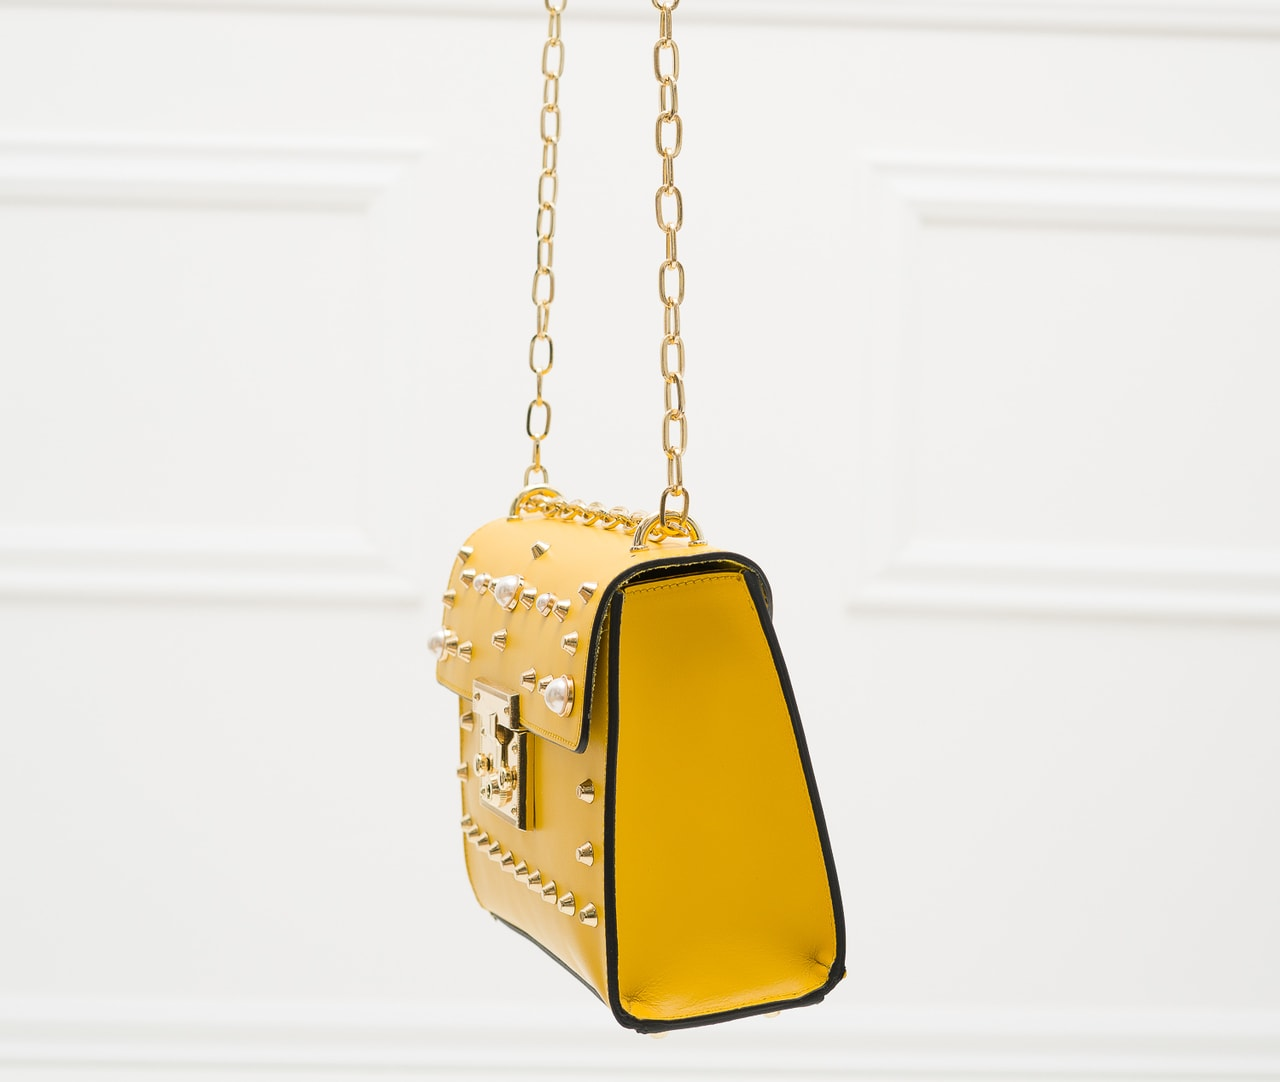 09817cd2d2 Glamadise.sk - Dámska kožená crossbody kabelky s perličkami - žltá ...